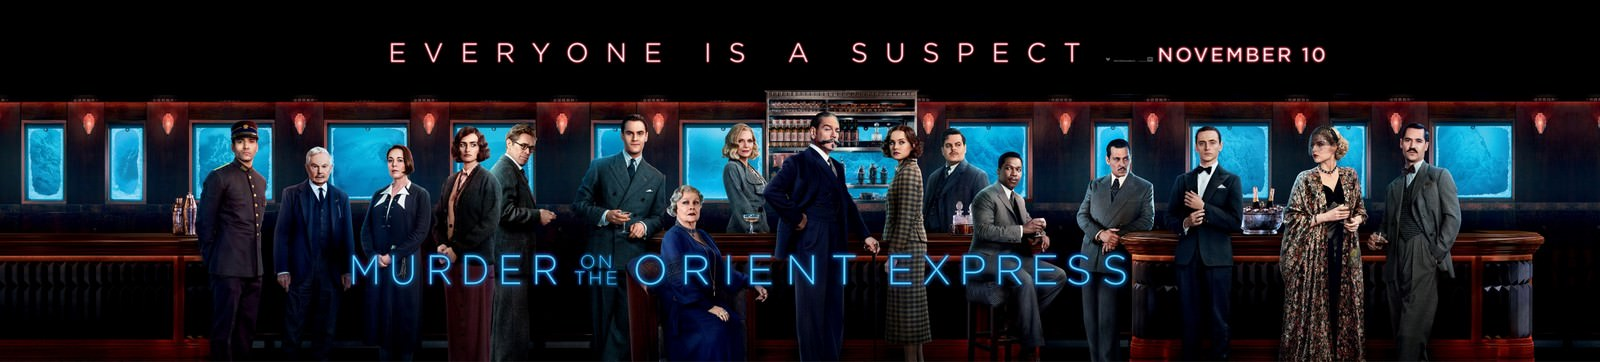 Movie, Murder on the Orient Express(美國, 2017) / 東方快車謀殺案(台灣.香港) / 东方快车谋杀案(中國), 電影海報, 美國, 橫版